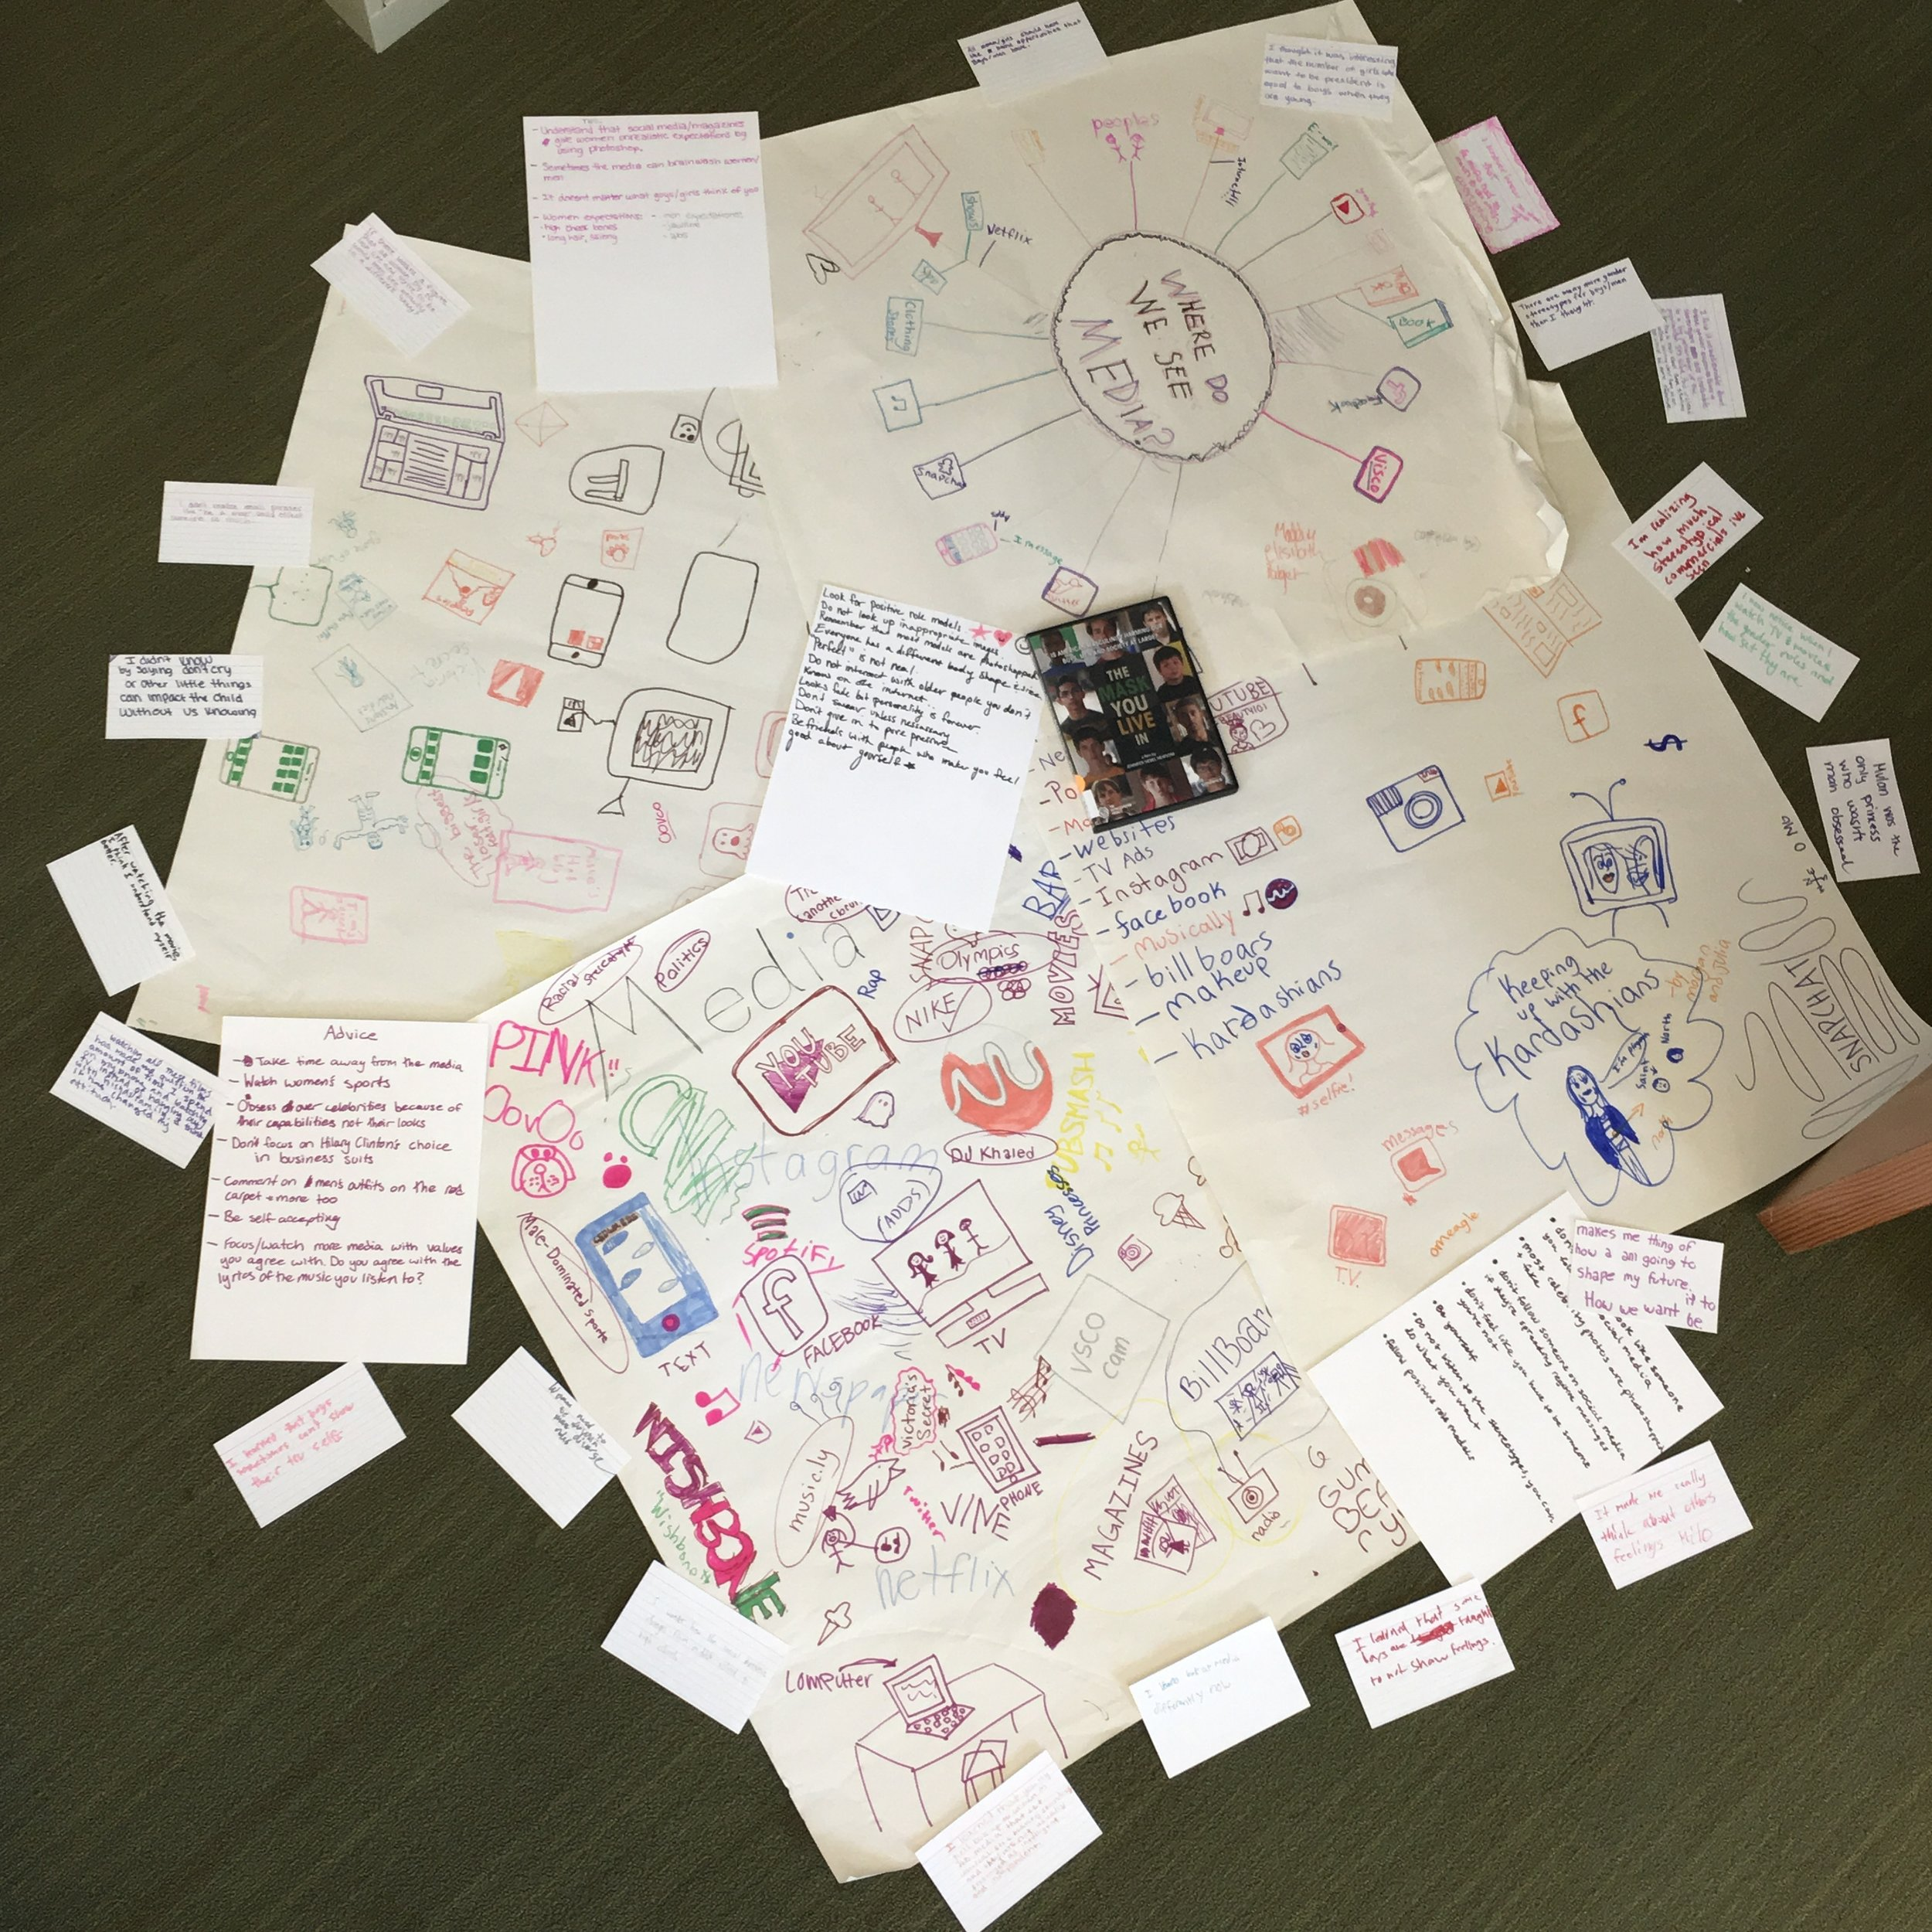 Students' ideas on media literacy